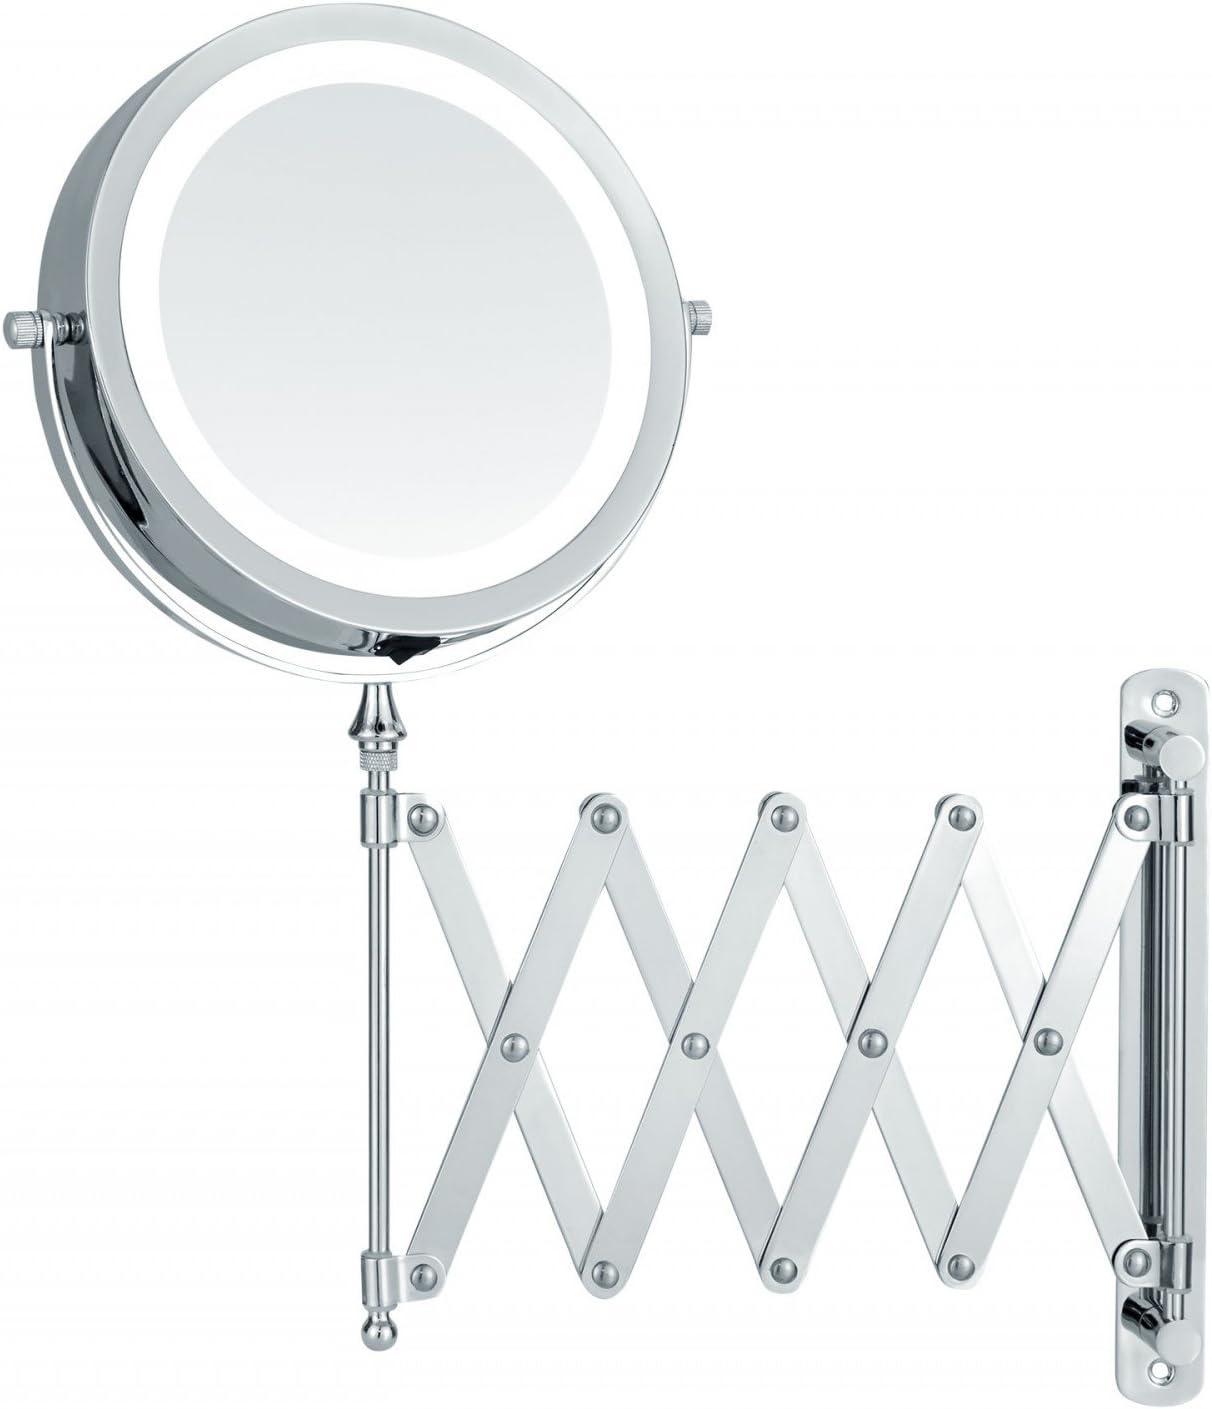 5M L/änge Make Up Licht 45 Leds SZILBZ Led Spiegelleuchte RGB und Kaltwei/ß LED Schminkspiegel Kit spiegel beleuchtung mit 45 Leds